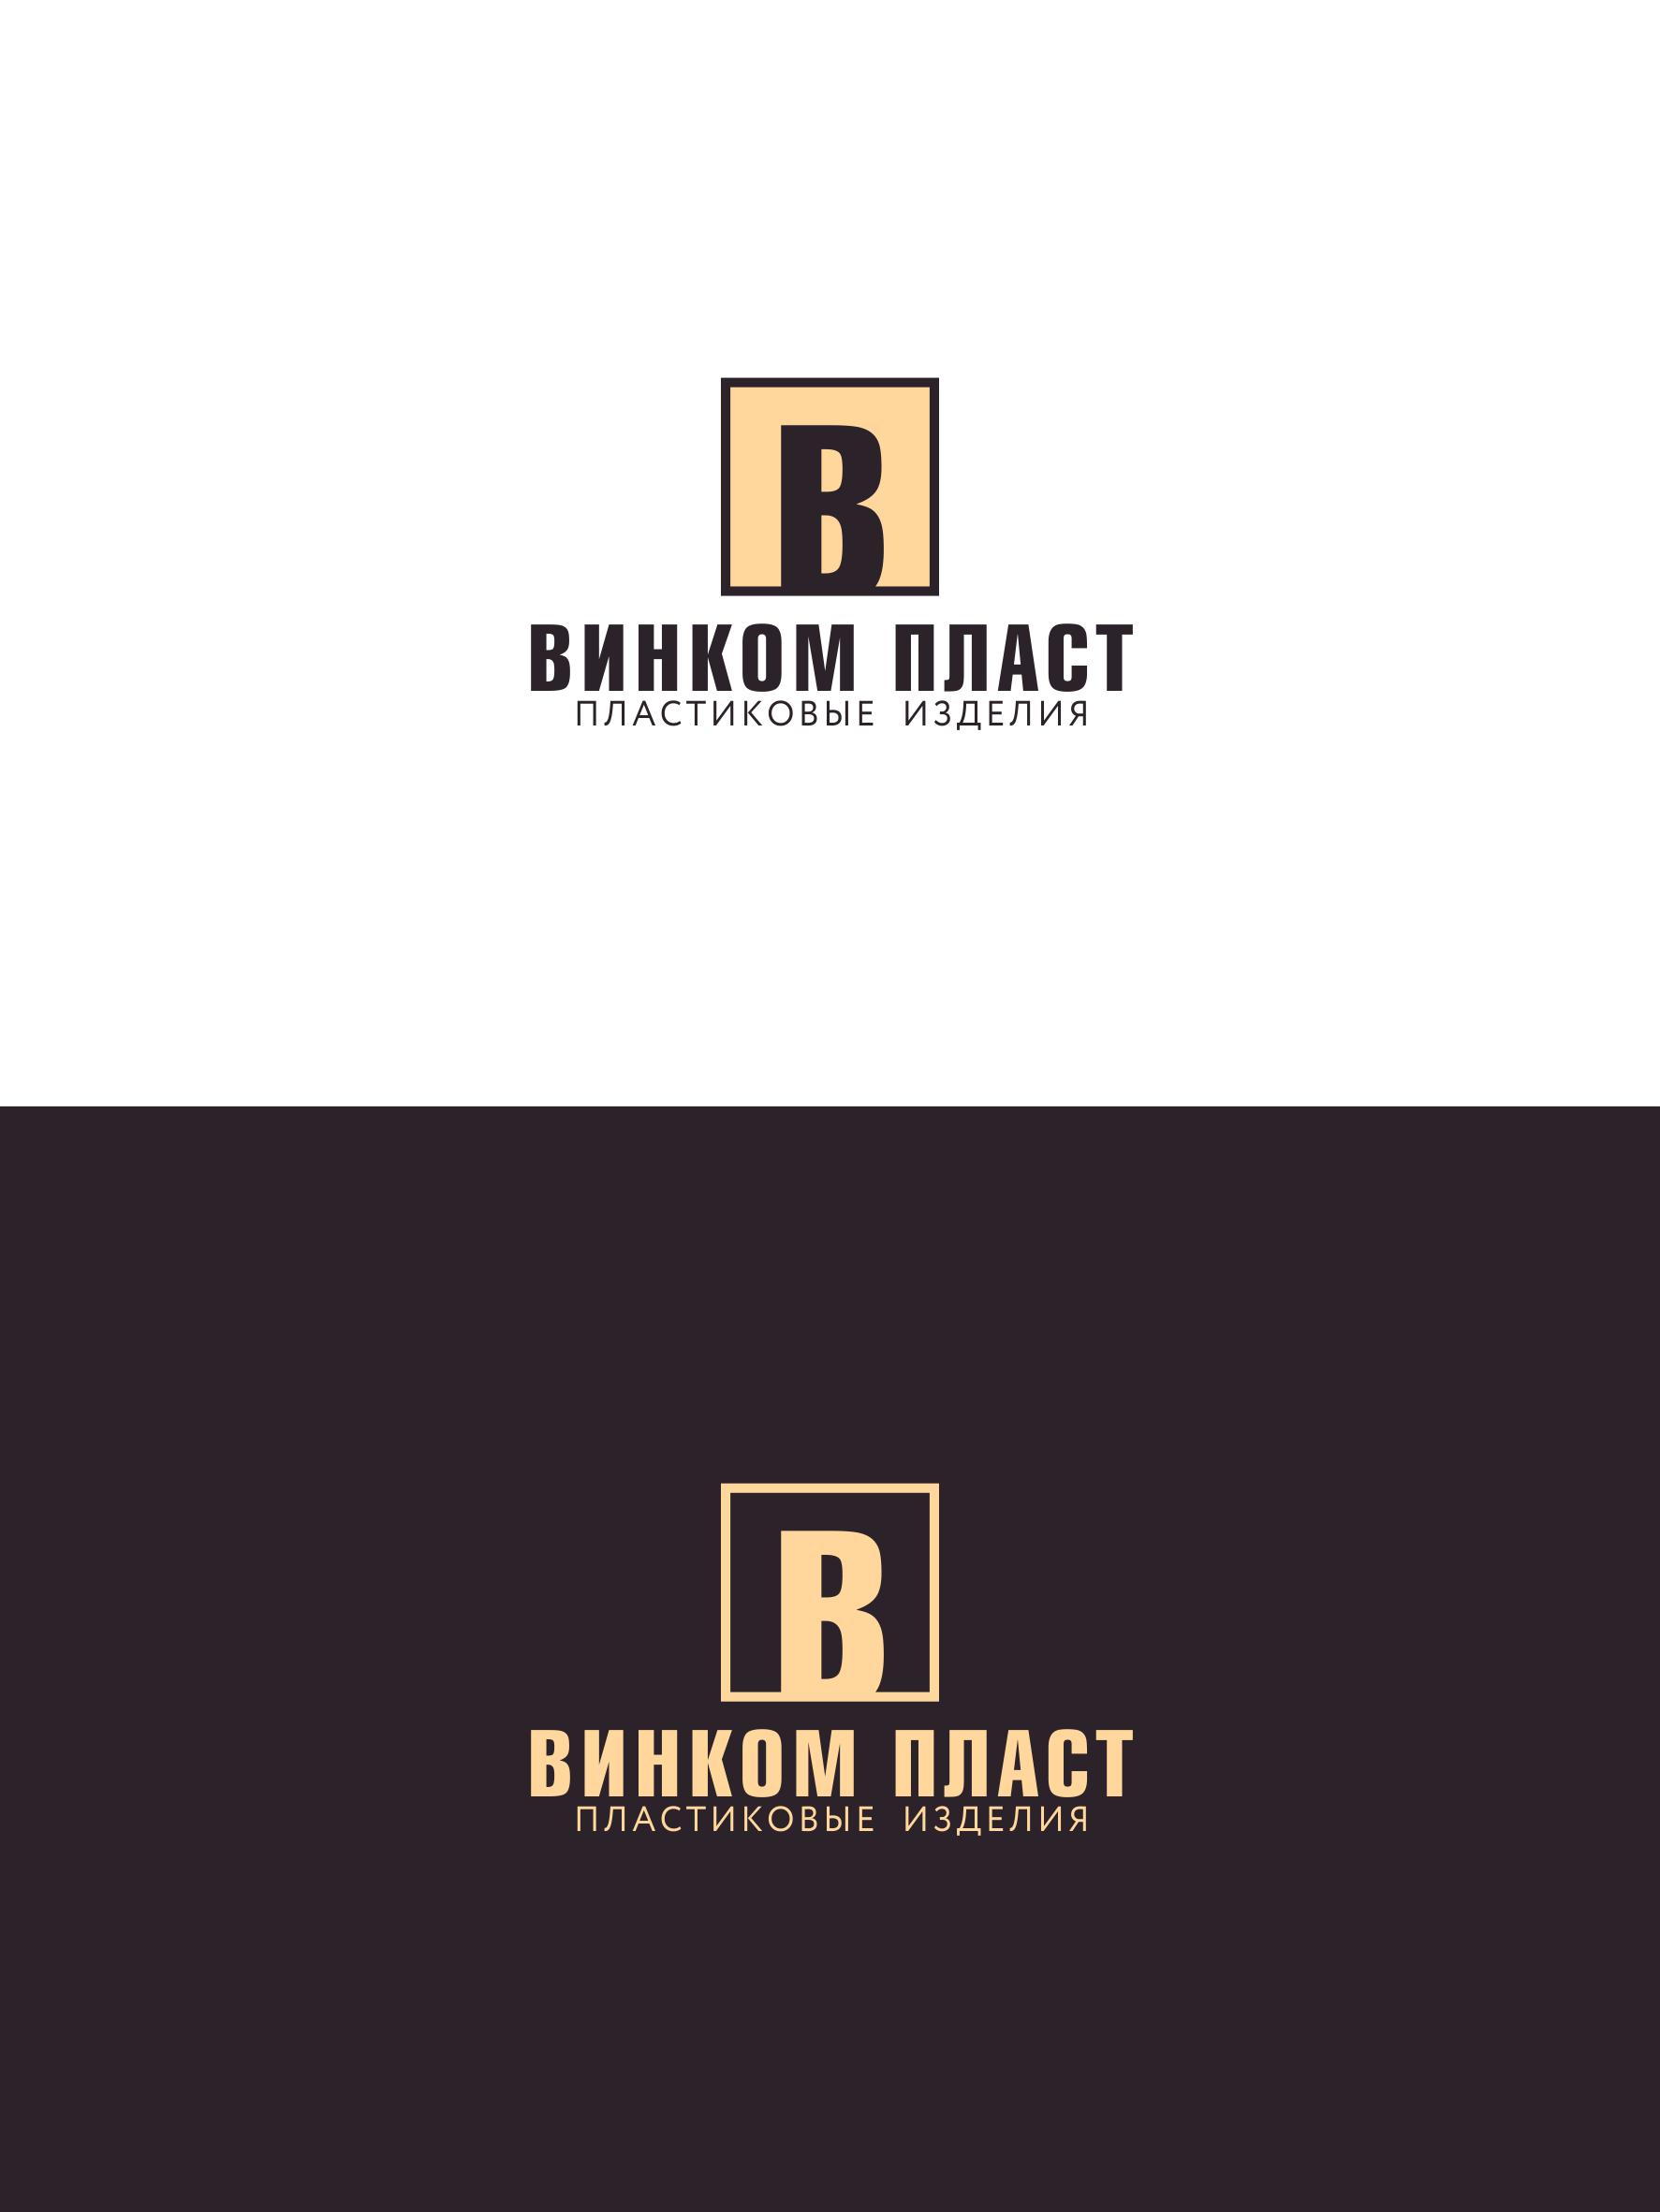 Логотип, фавикон и визитка для компании Винком Пласт  фото f_9055c3c5689a2dab.png